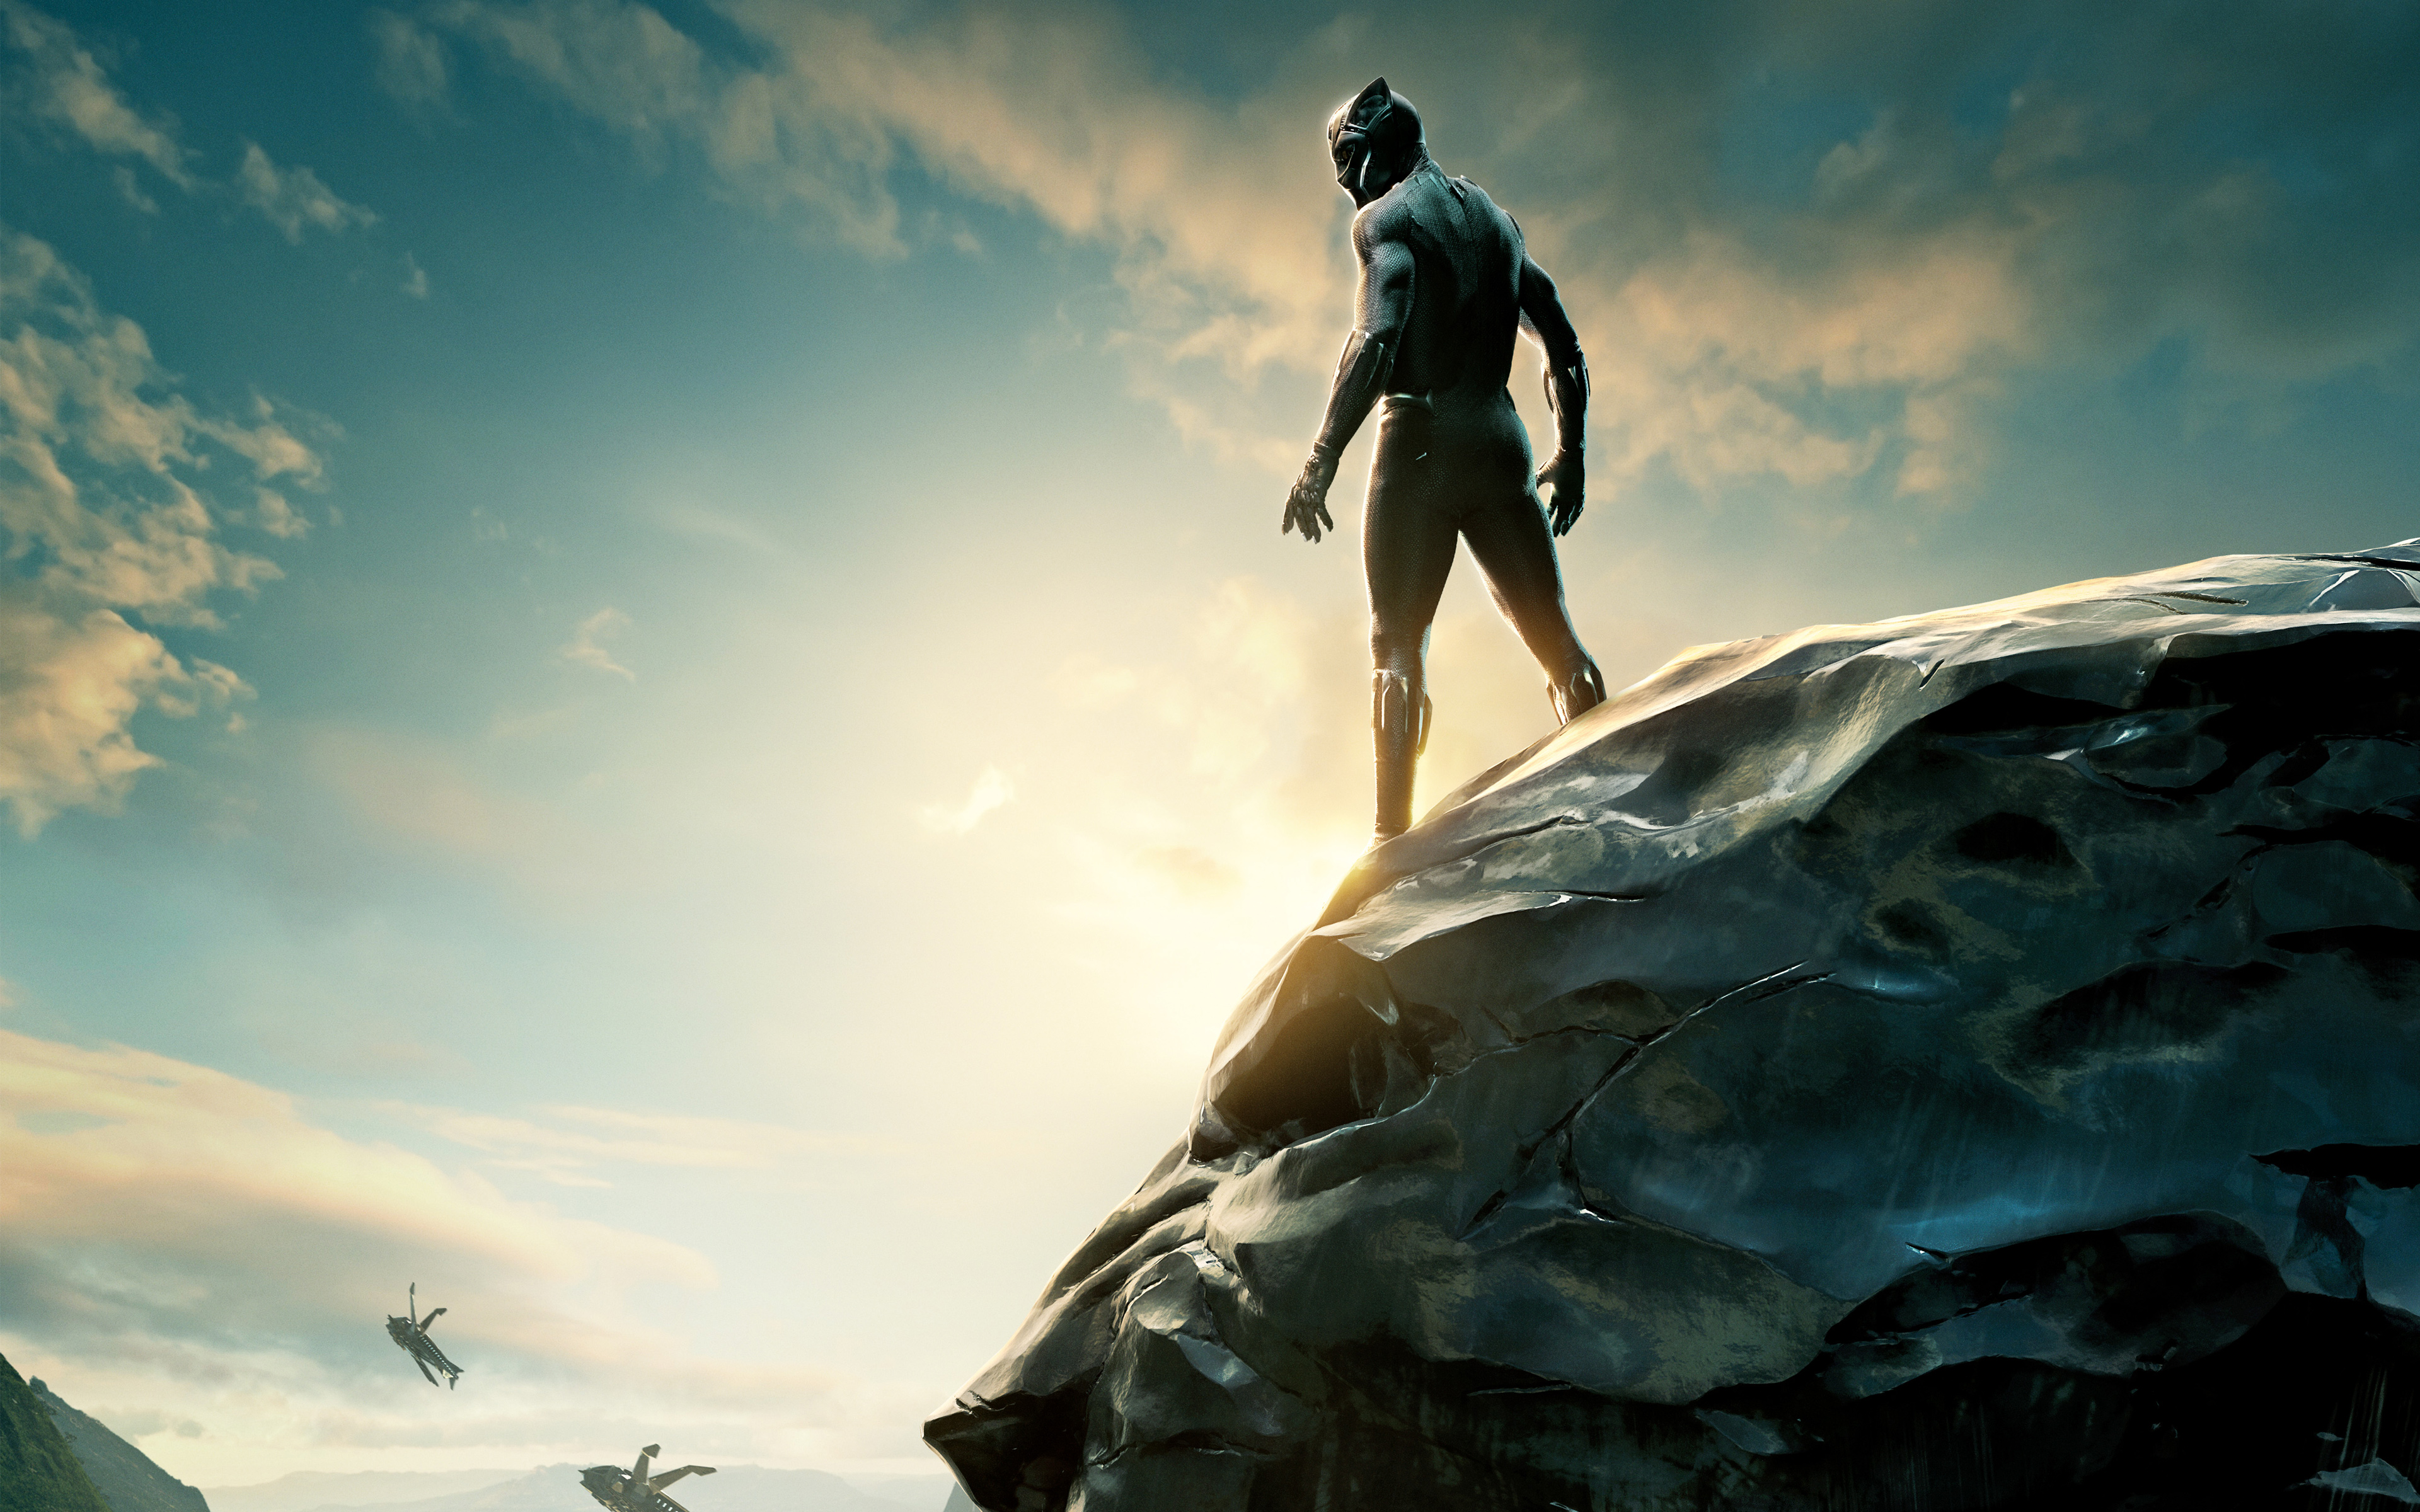 EMU Students React to Marvel's Black Panther – EMU Gündem Newspaper